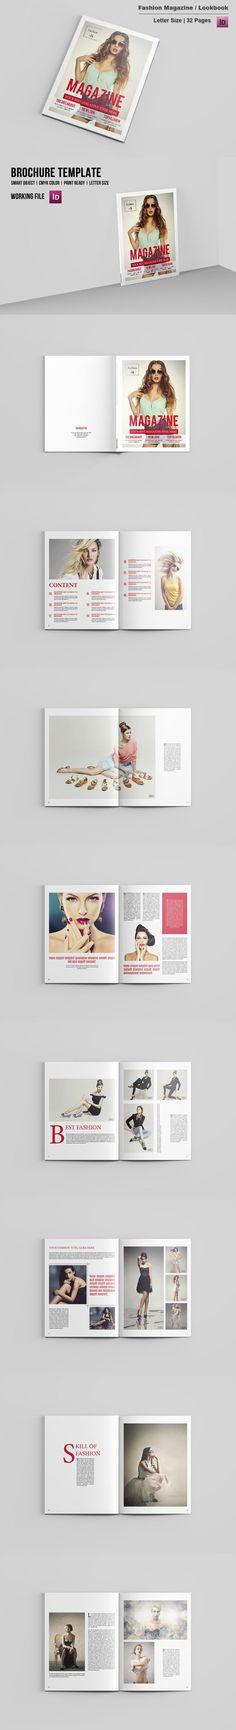 #magazine #design from Template Shop | DOWNLOAD: https://creativemarket.com/sismic/679152-Fashion-Photography-Magazine-V494?u=zsoltczigler